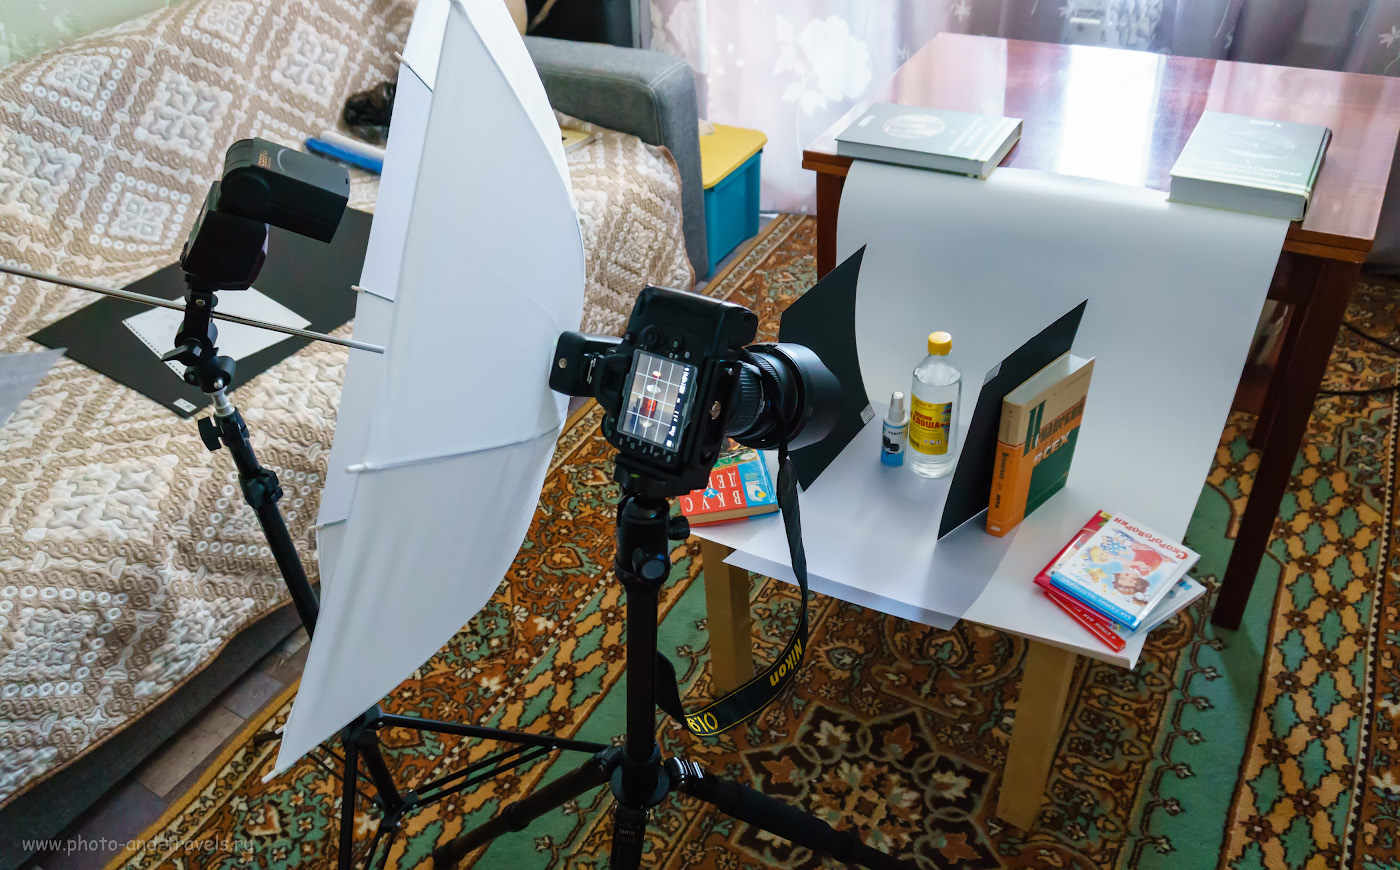 Фото 6. Съемка бензина «Галоша» перед началом ремонта резинок объектива Nikon. Снято на беззеркальный фотоаппарат Sony A6000 KIT 16-50mm f/3.5-5.6. Настройки: 1/60, +2.0 EV, 3.5, 3200, 16.